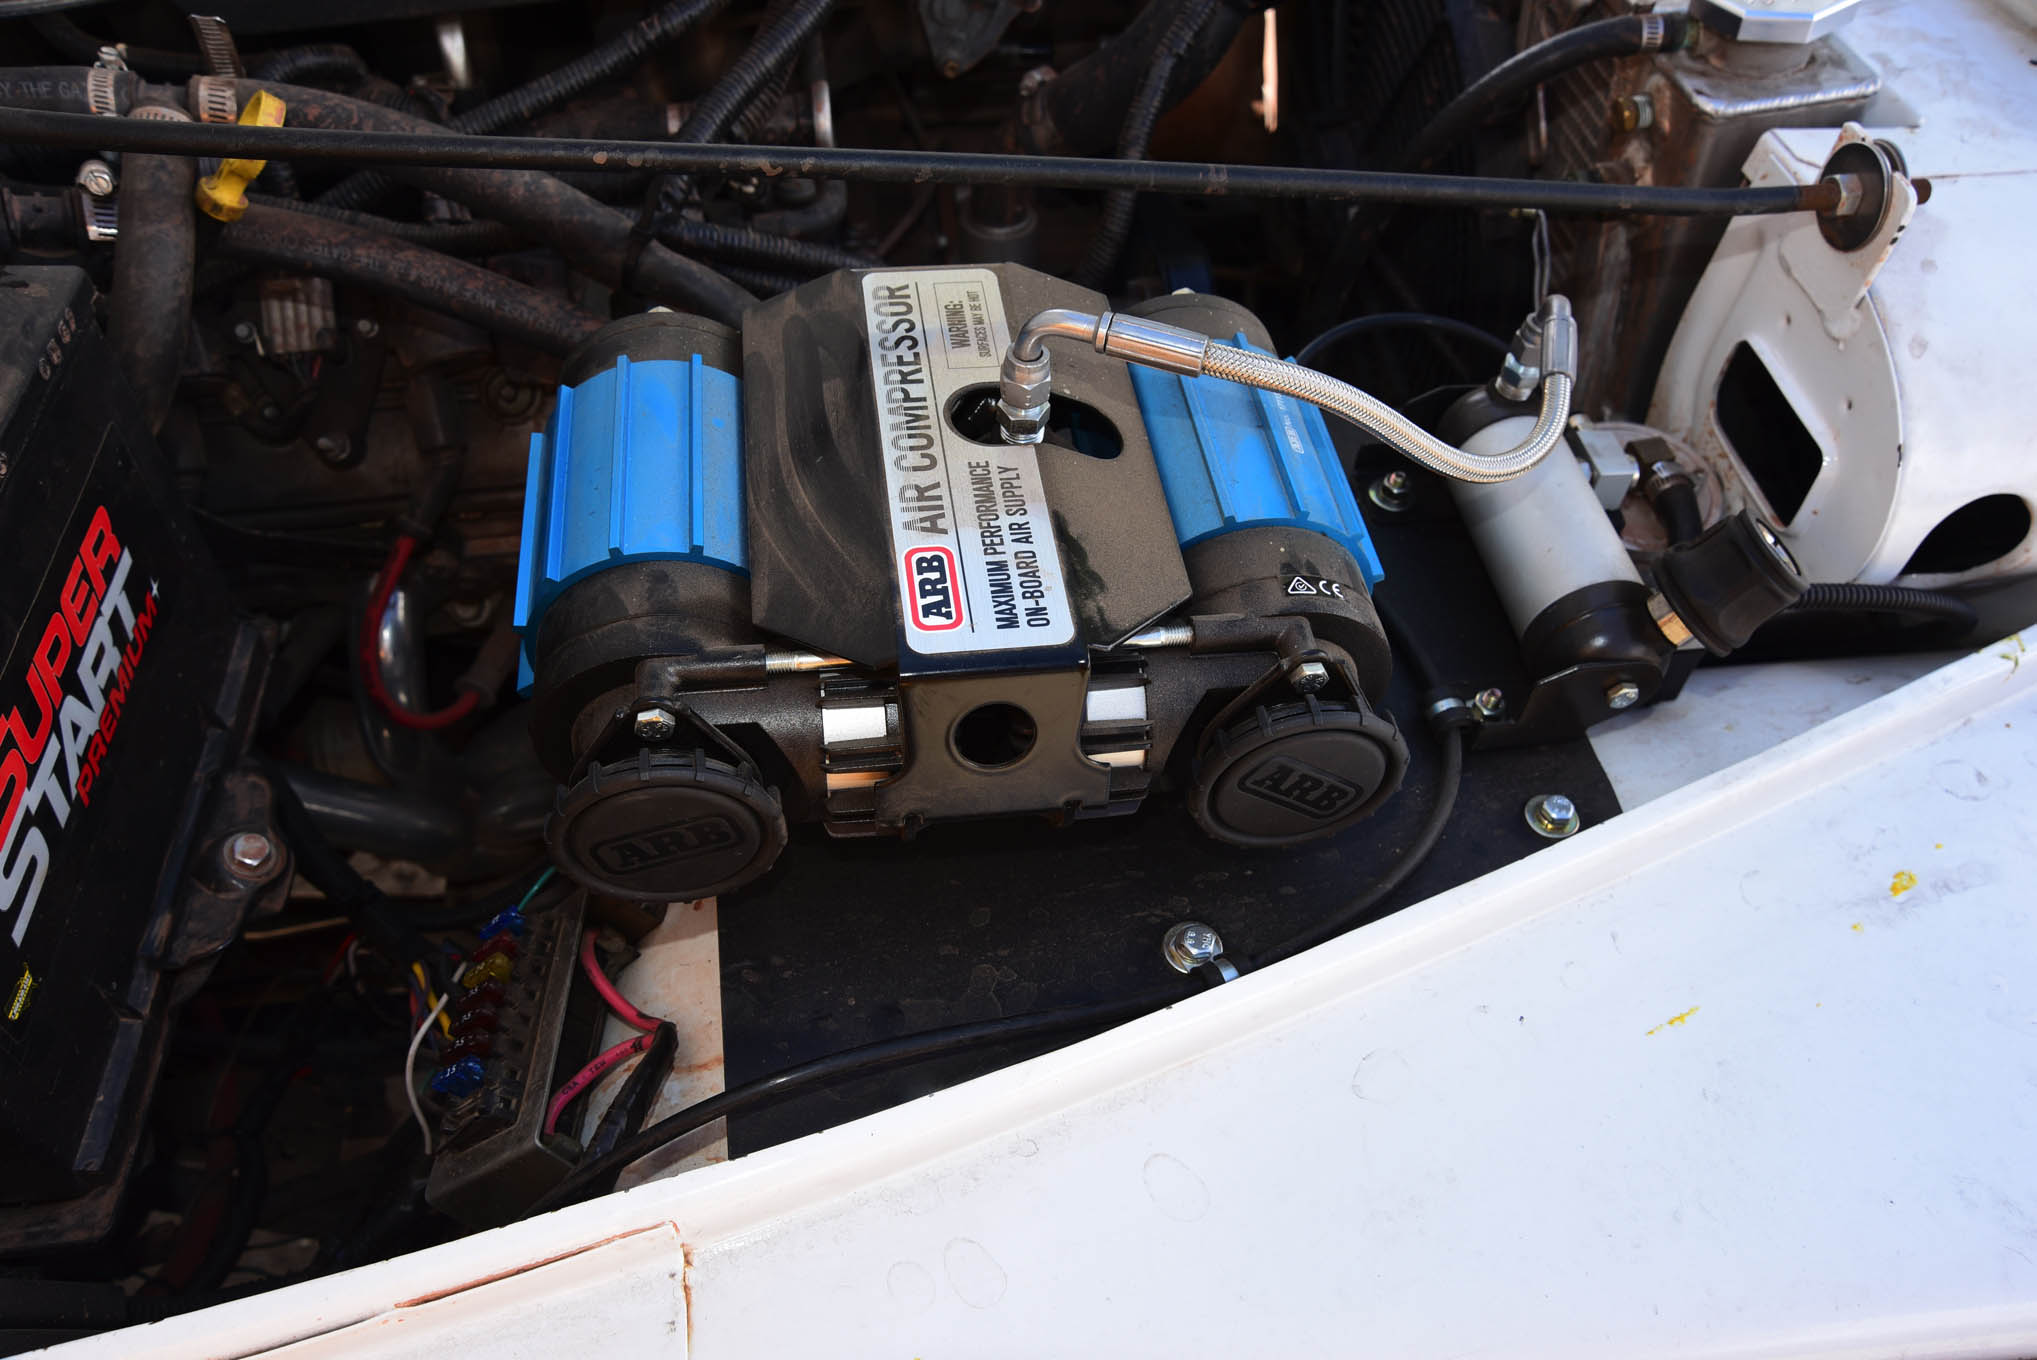 011 jeep 1984 scrambler cj8 cj 8 jp magazine stuart bourdon aaron paris